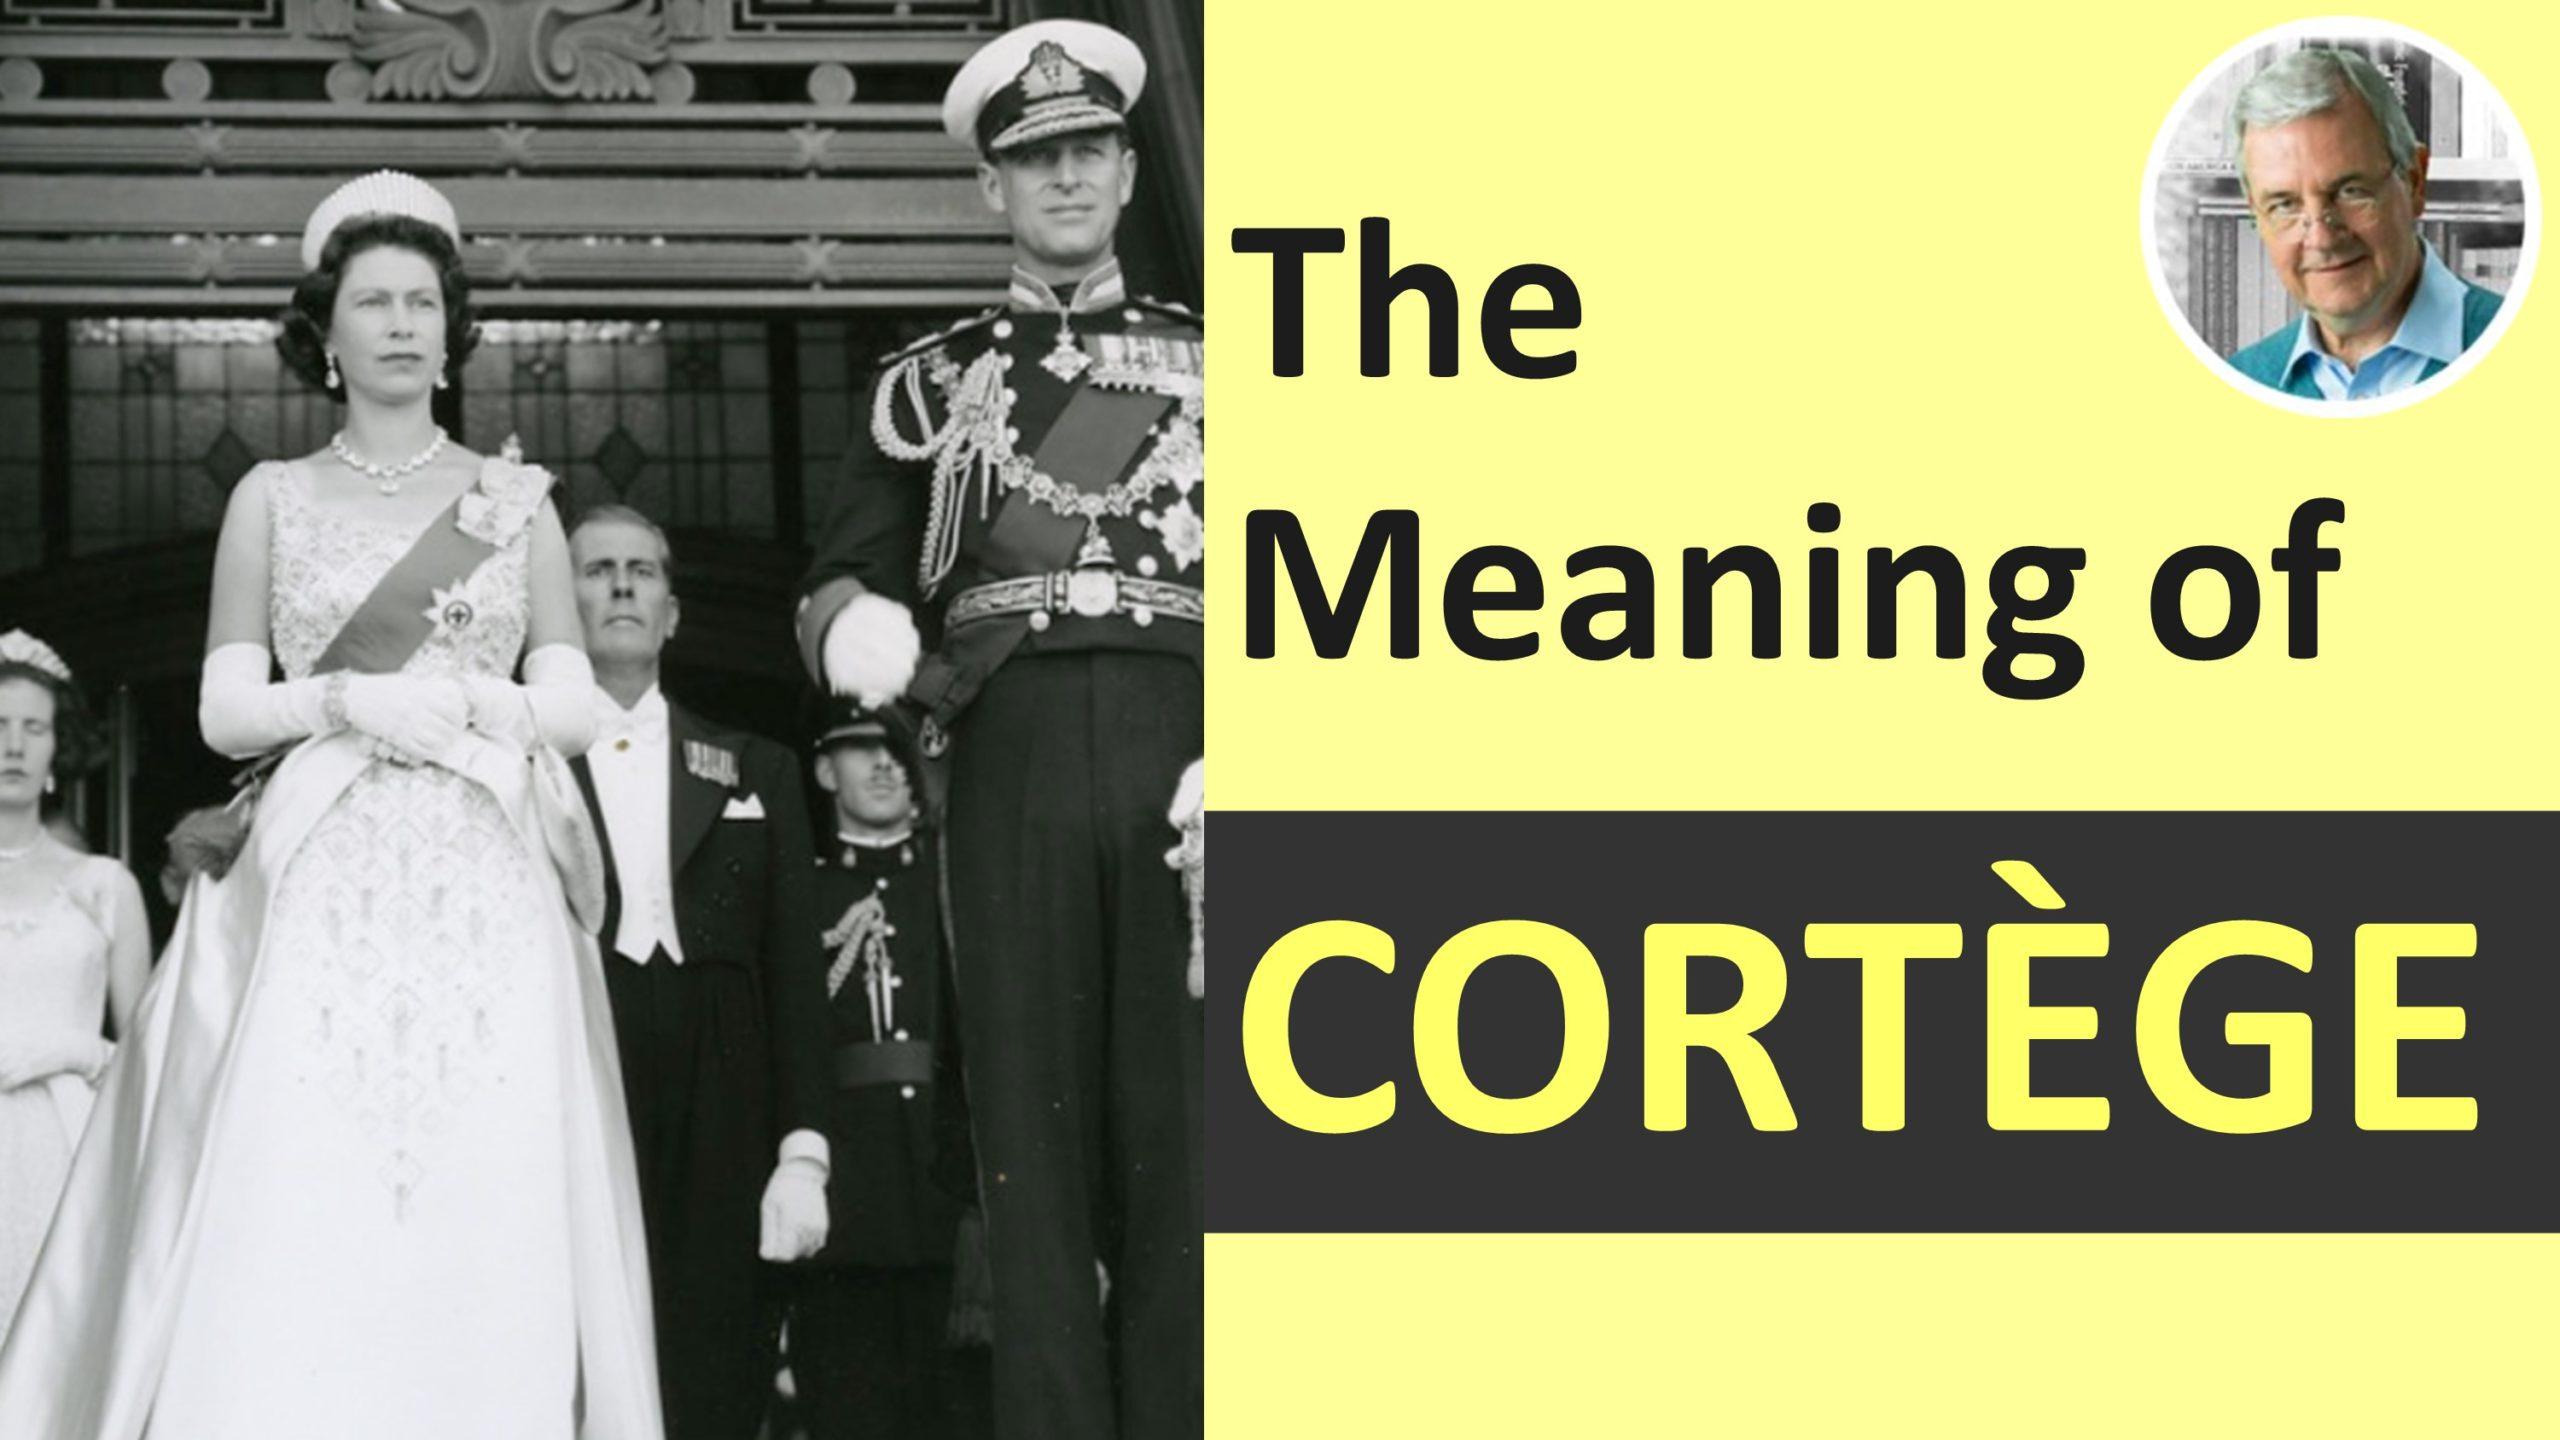 definition of cortege